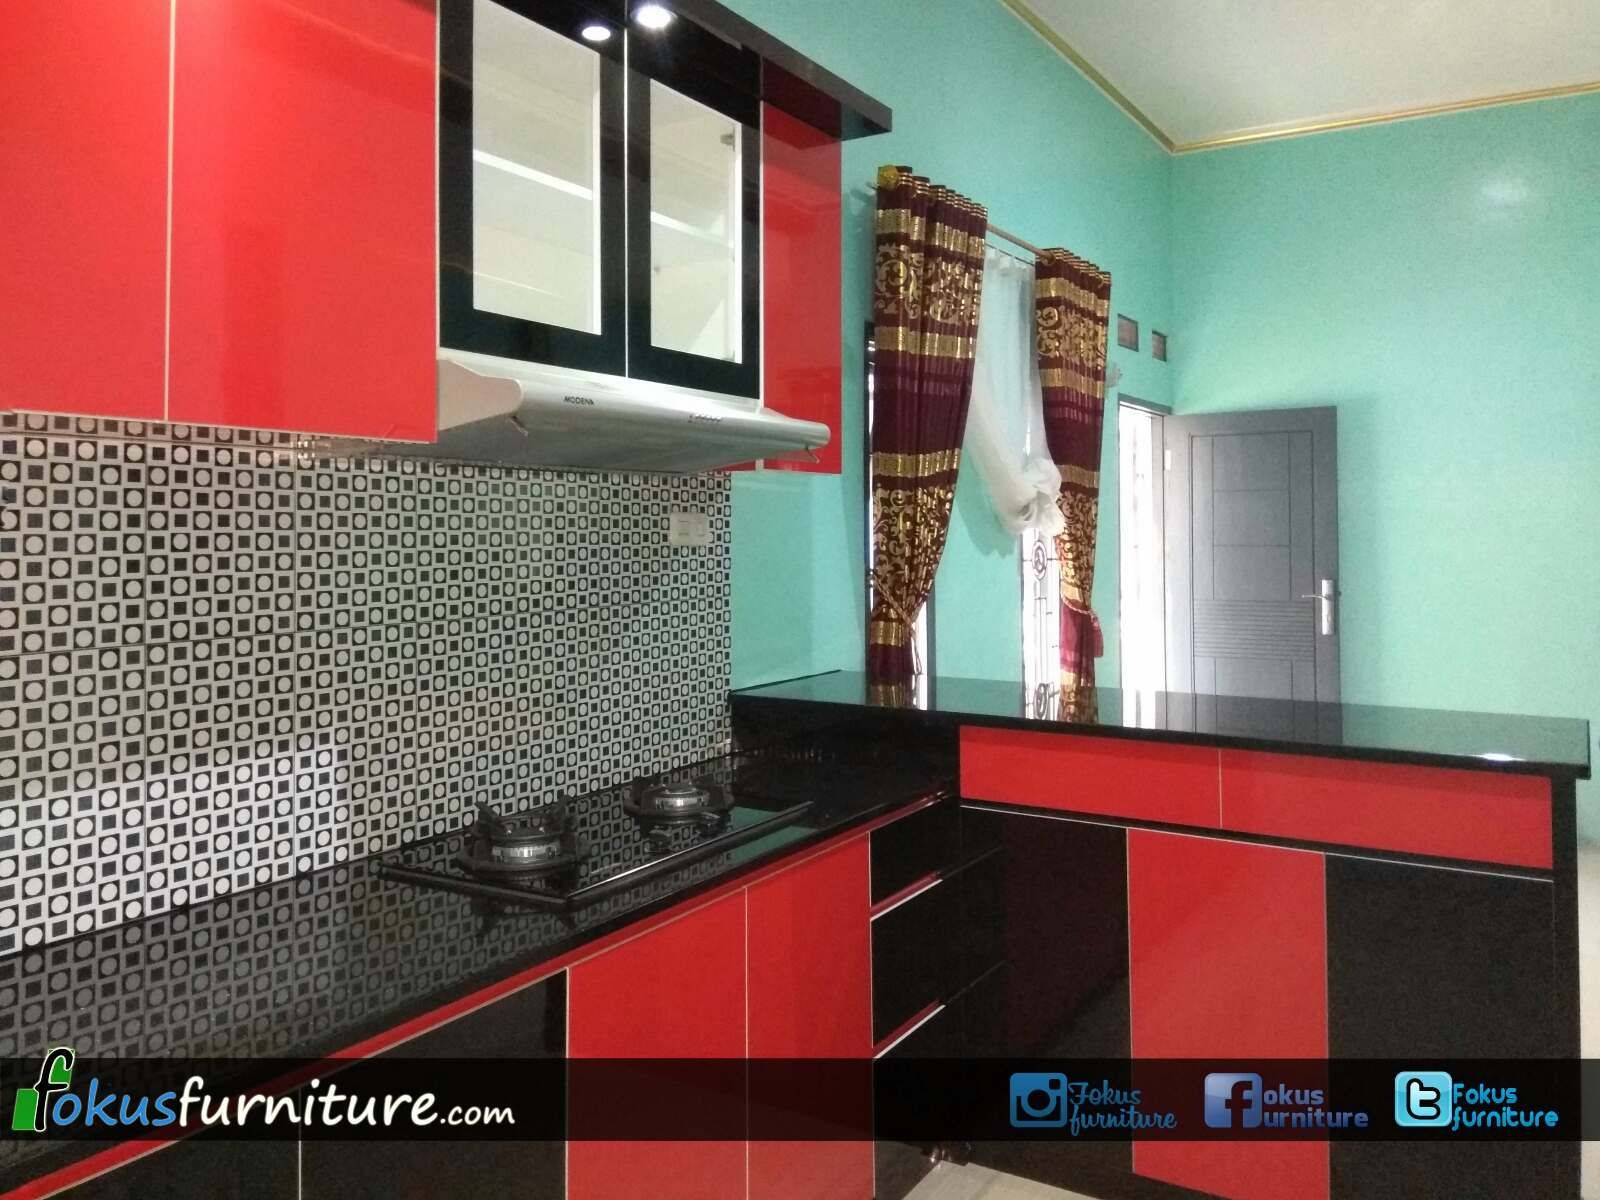 Kitchen set merah hitam fokusfurniture com kitchen setlemaricustom furniture kitchen sets kitchen kitchen cabinets